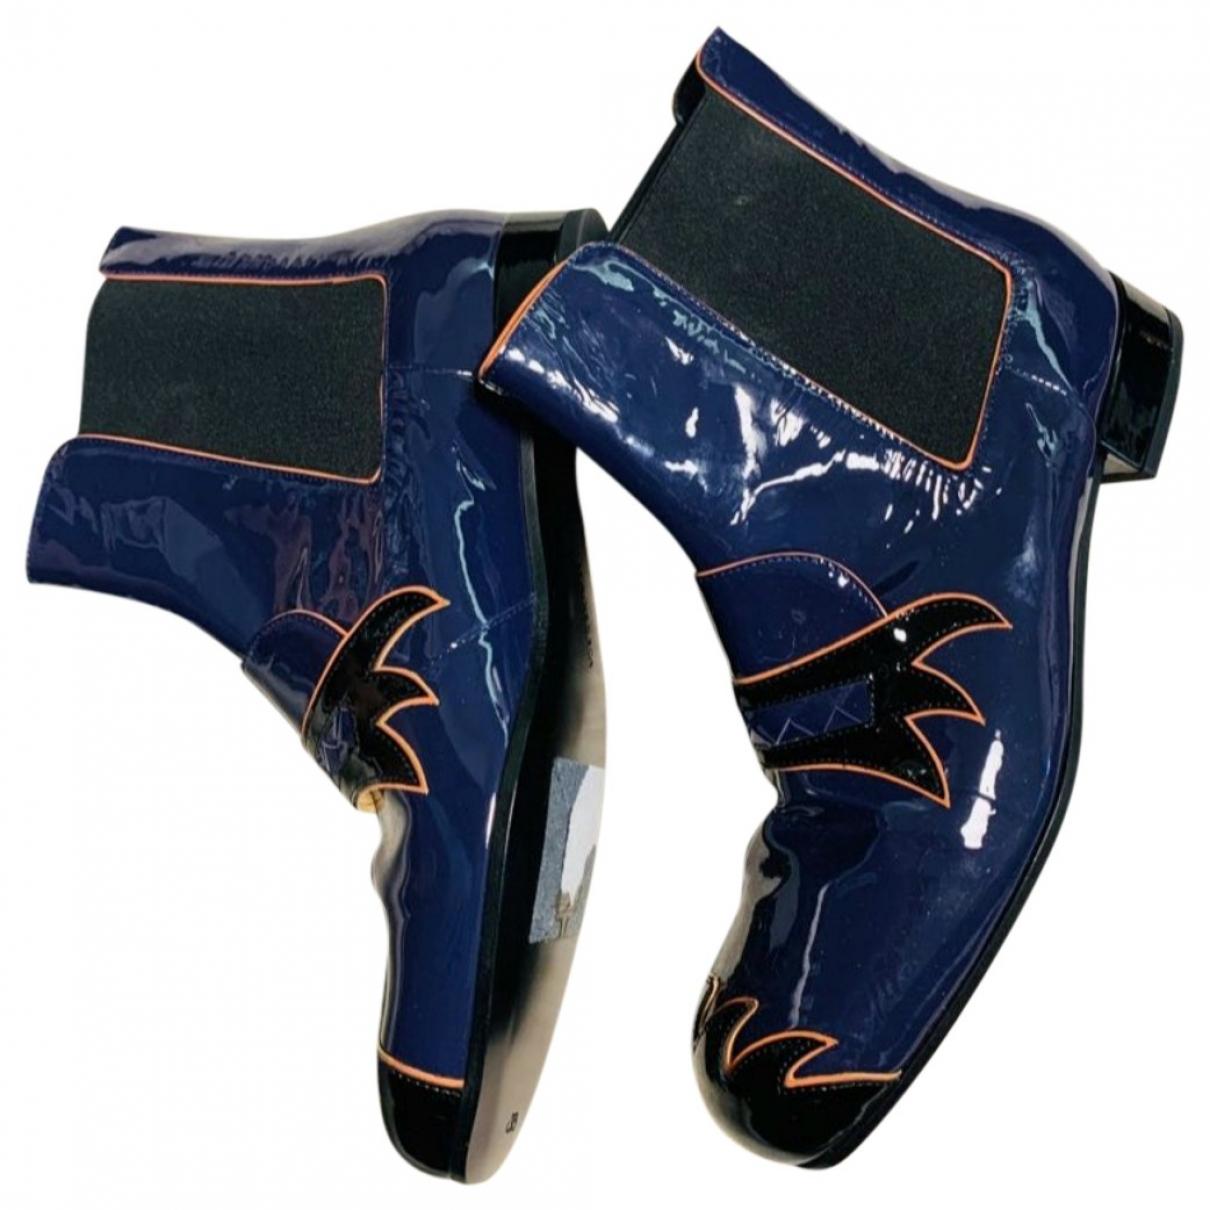 Bottega Veneta - Boots   pour femme en cuir verni - marine